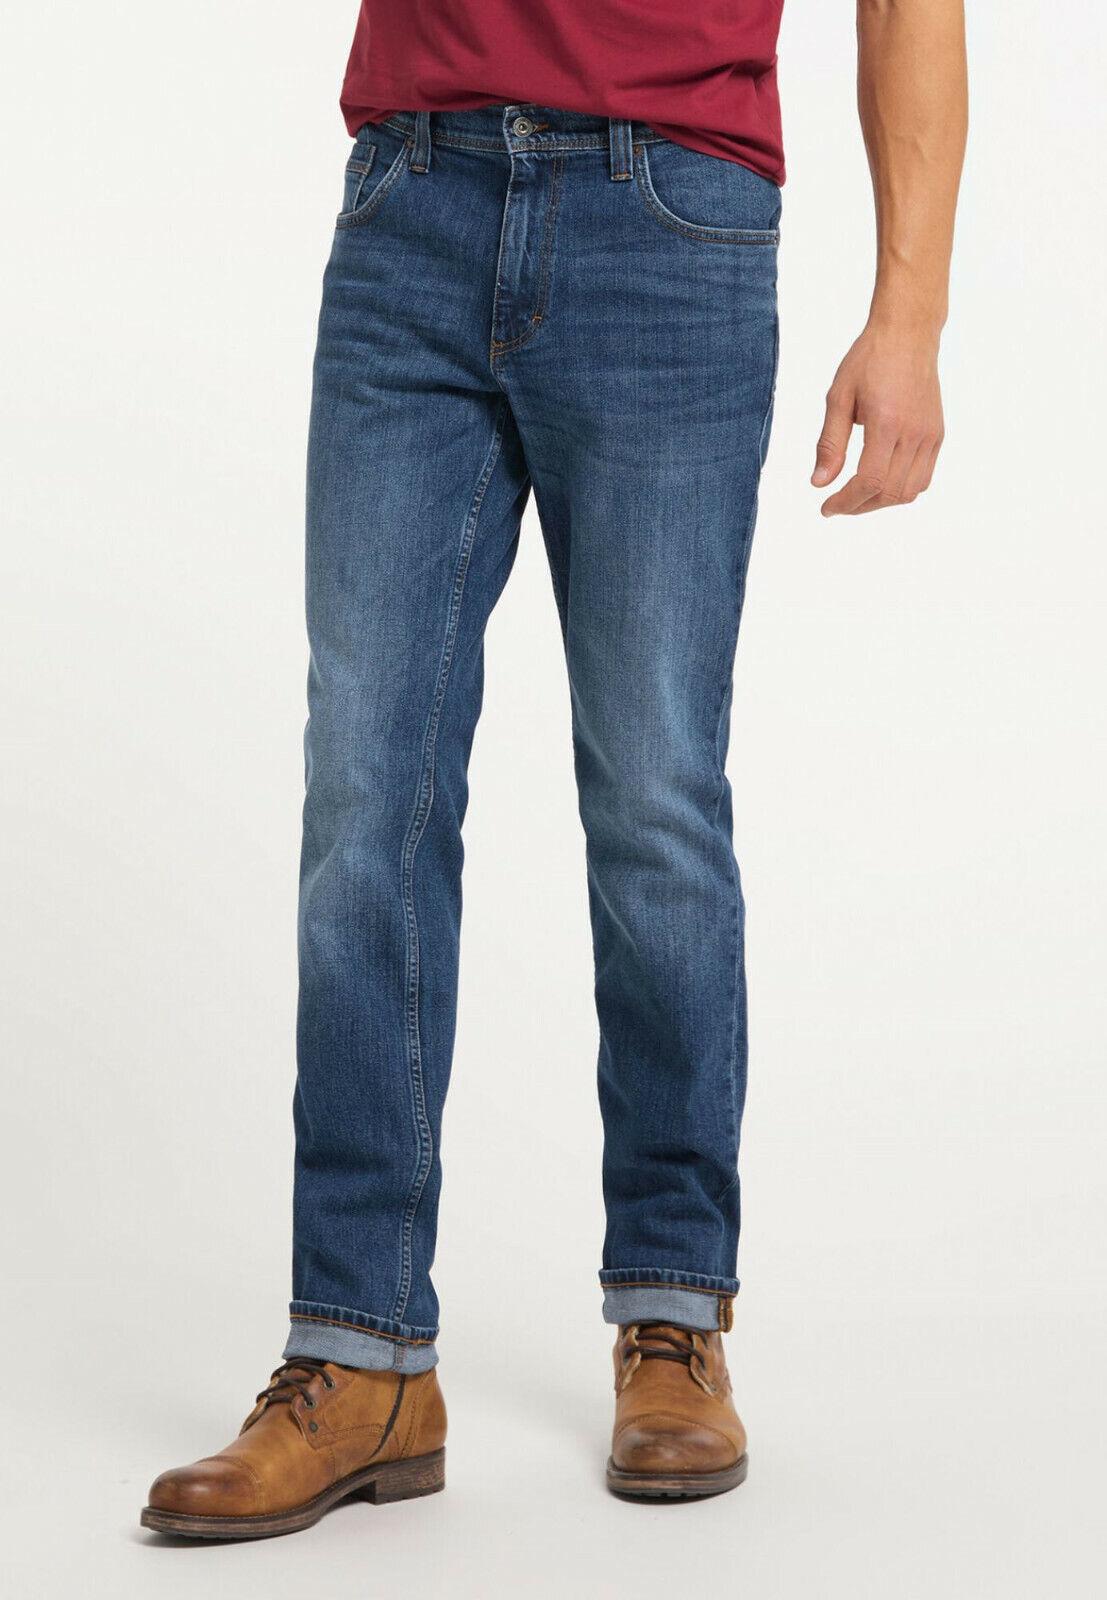 Mustang Washington Medium Rise Herren Jeans / Used-Finish / Elasthan